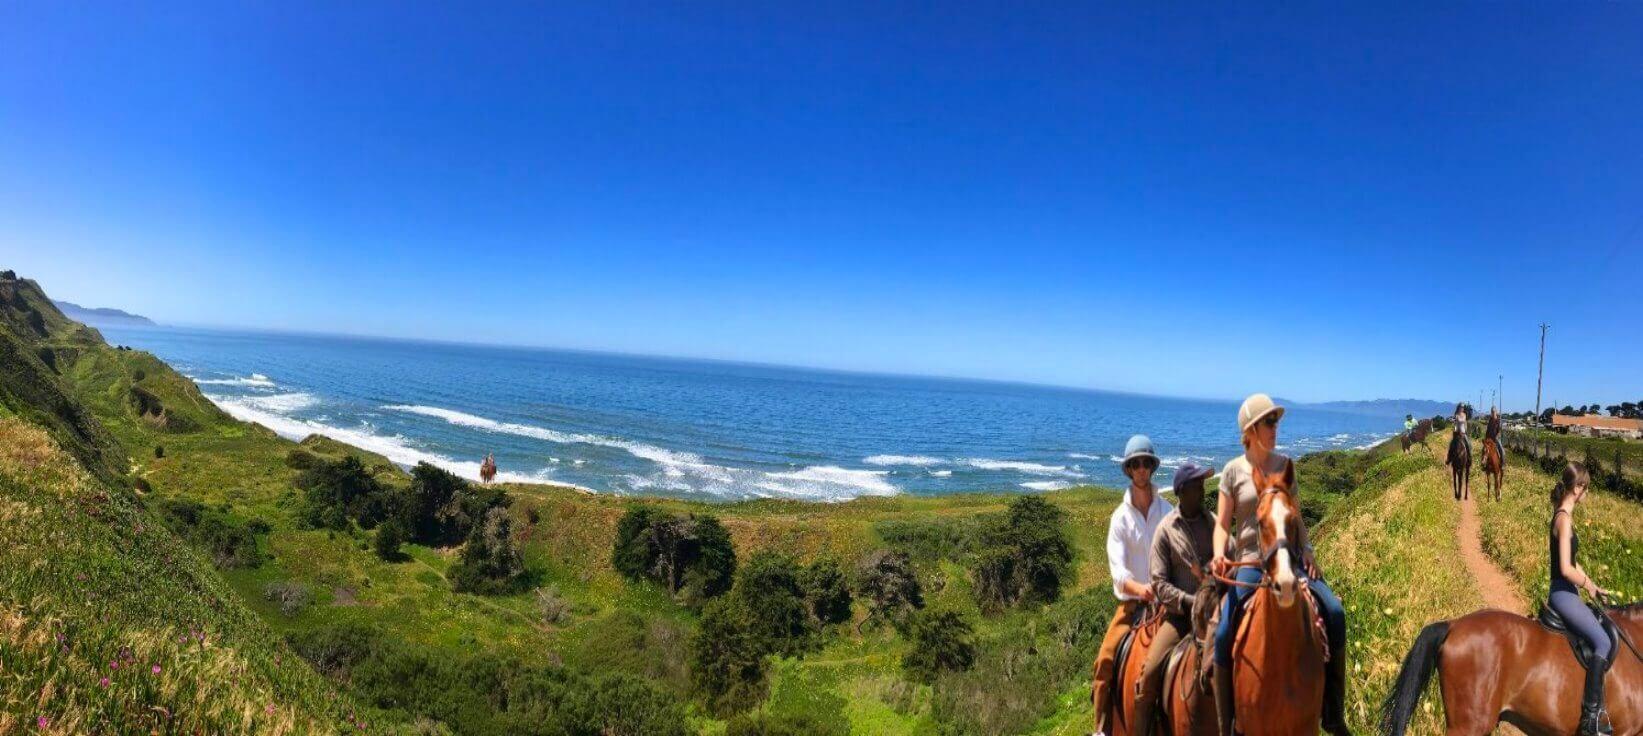 Horseback-Rides-on-The-Beach-_Neary-San-Francisco